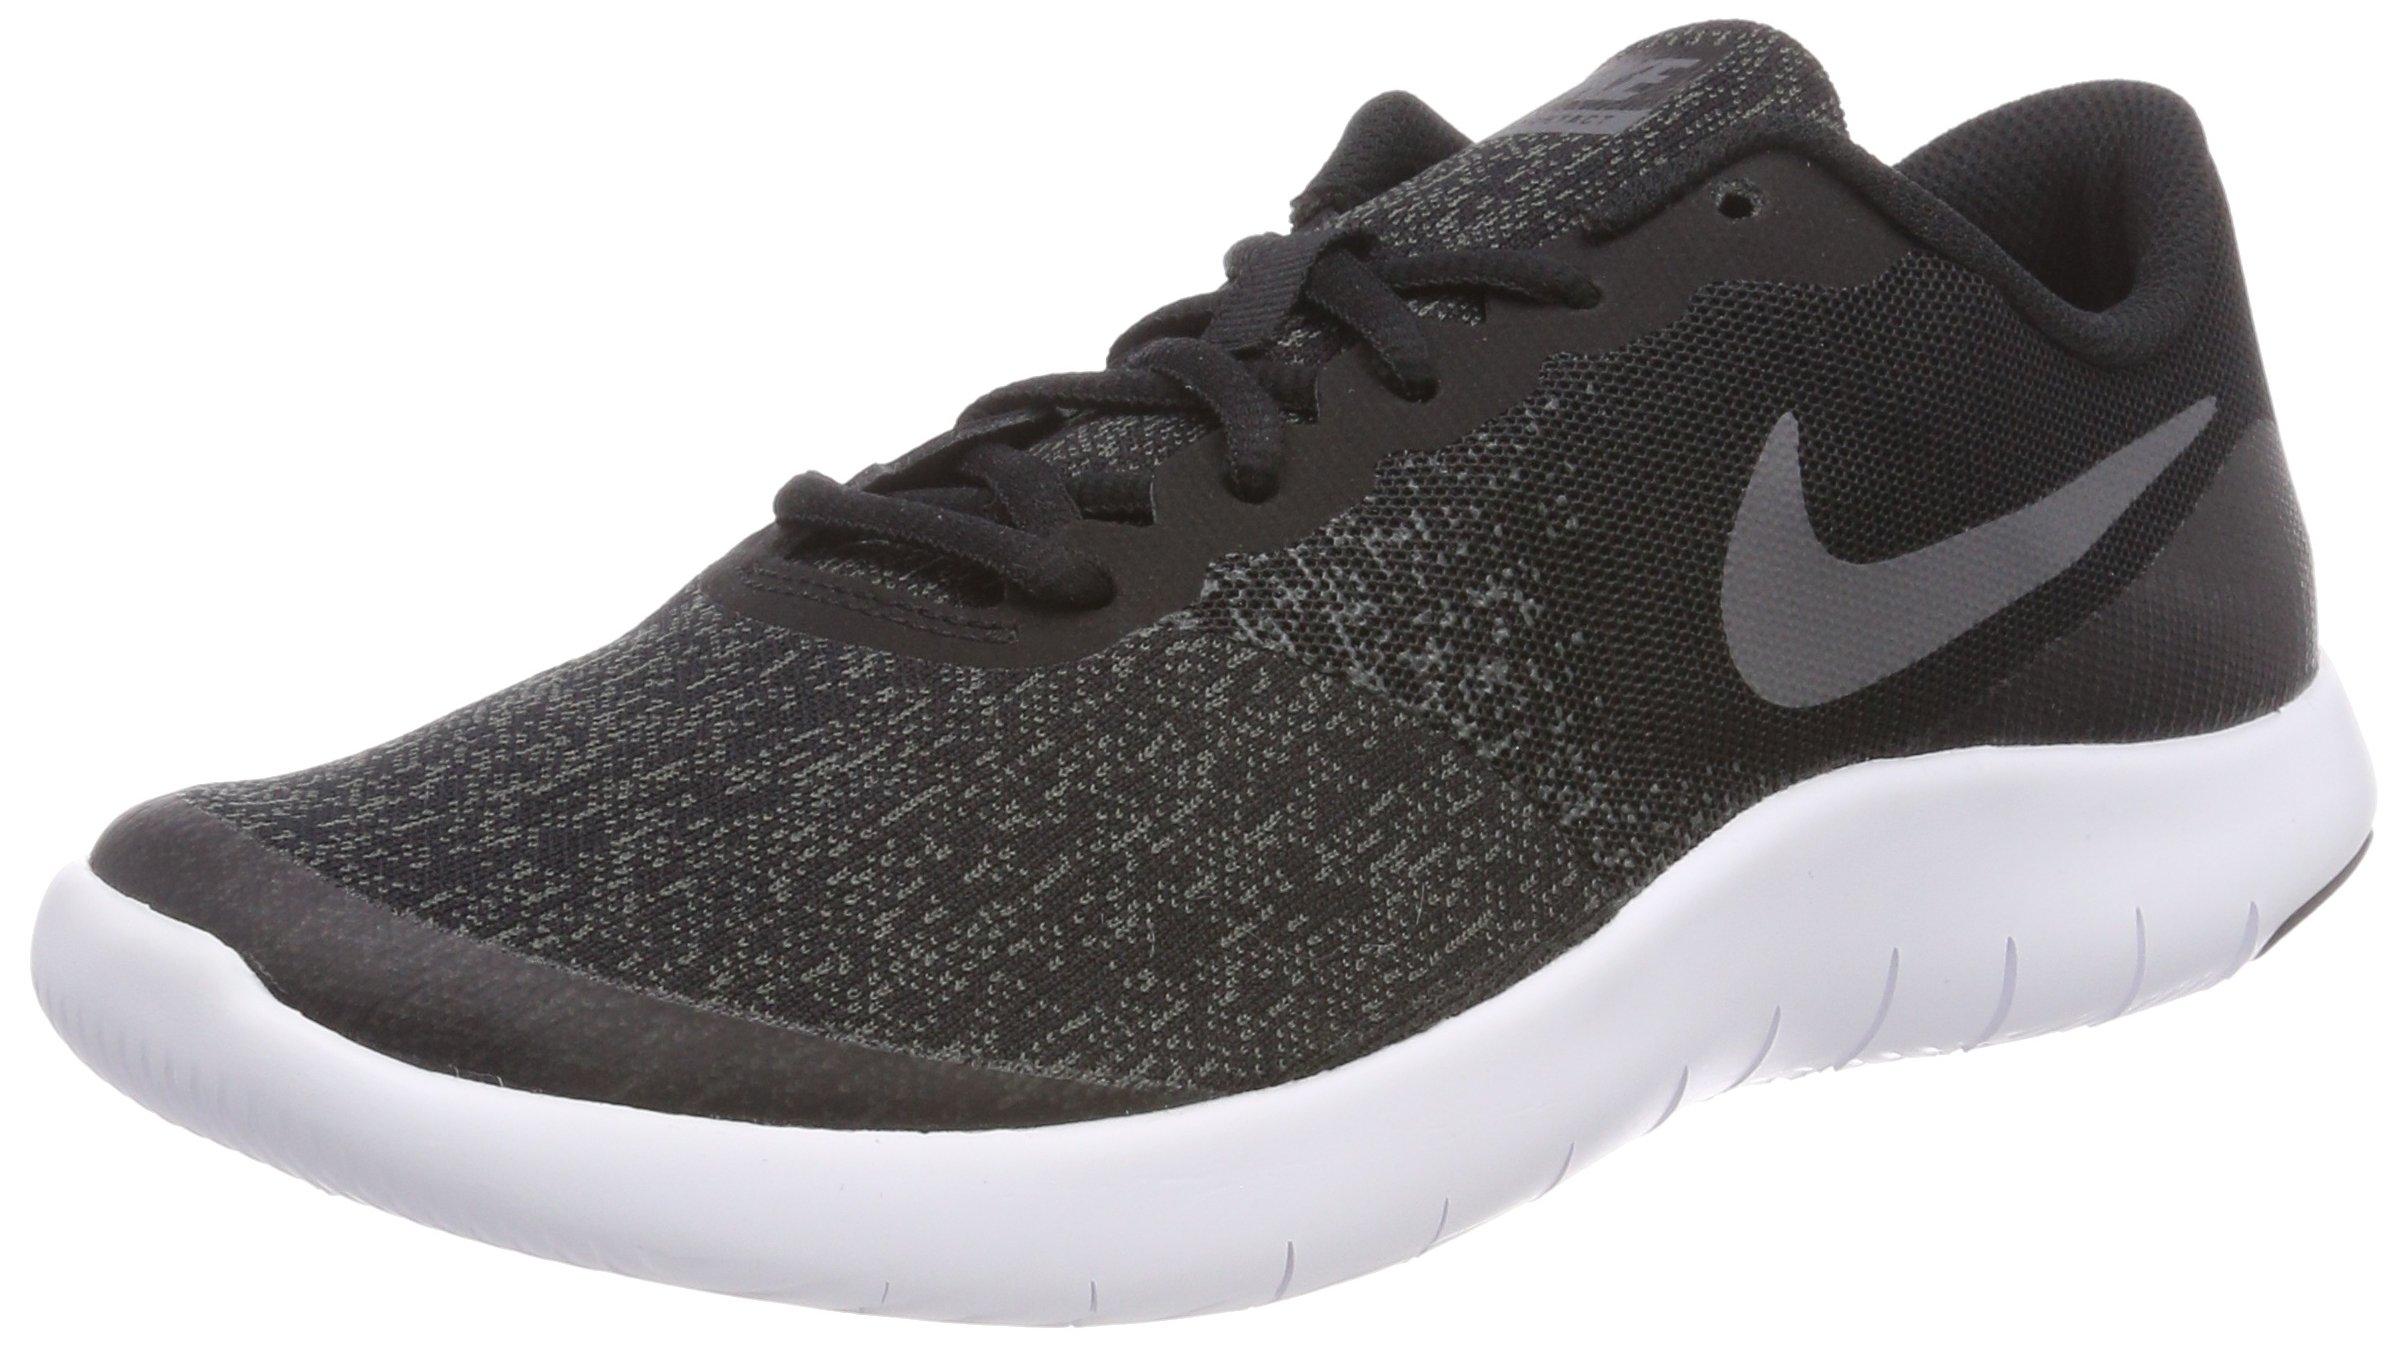 Nike Kids Flex Contact (GS) Black/Dark Grey/Anthracite Running Shoe, 7 Big Kid